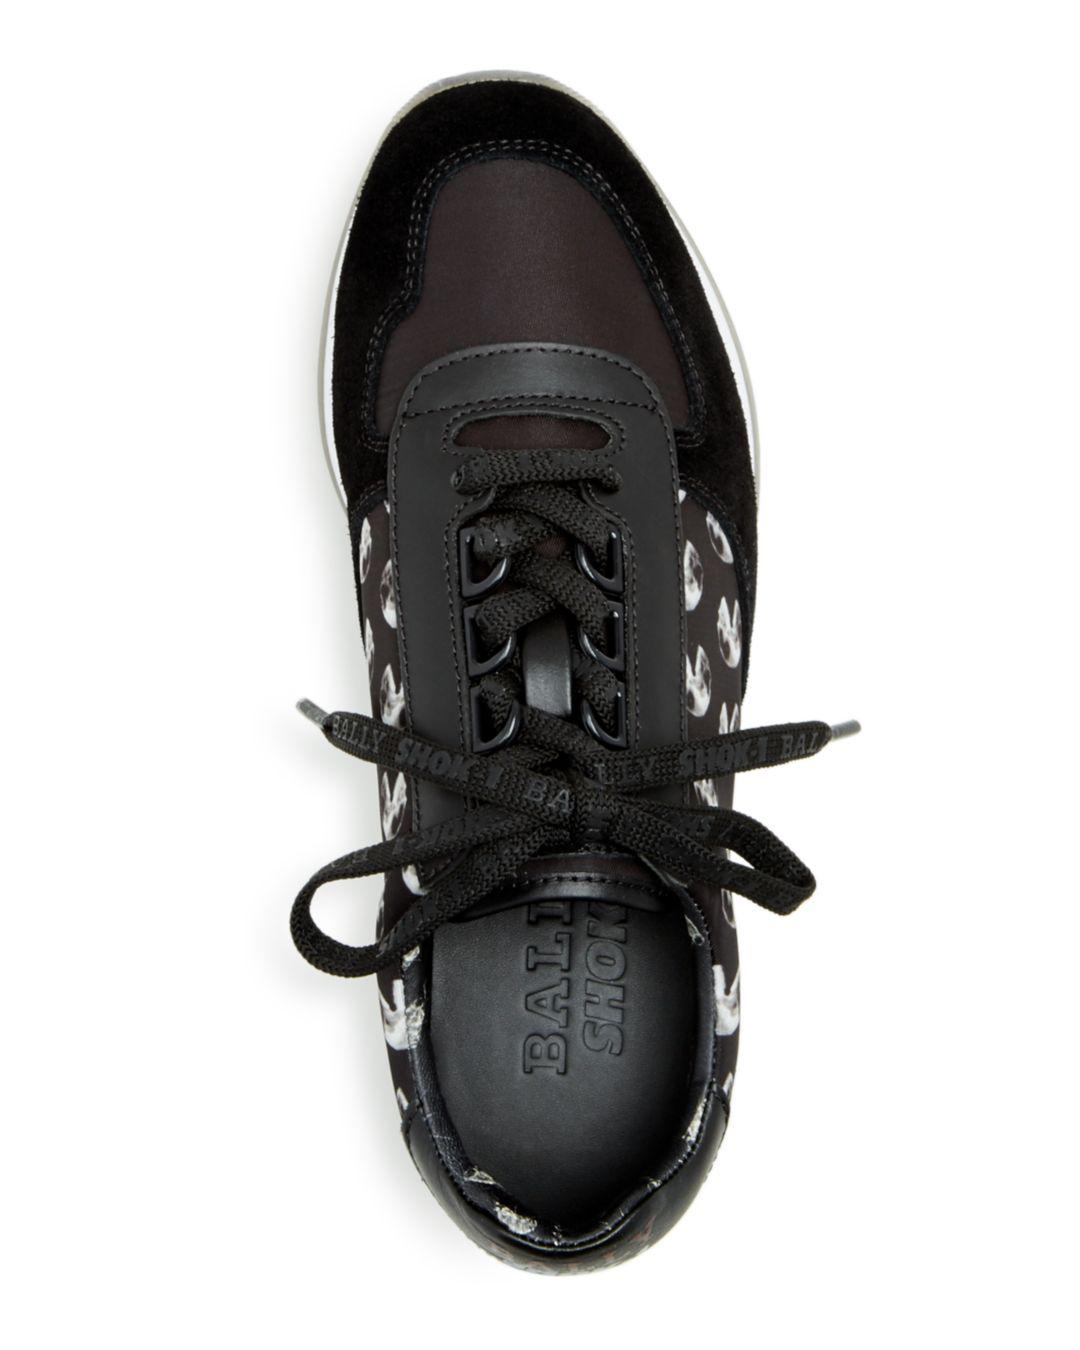 16c21bc22be Bally - Black X Swizz Beatz Women s Gavino The Consumer Low-top Sneakers -  Lyst. View fullscreen